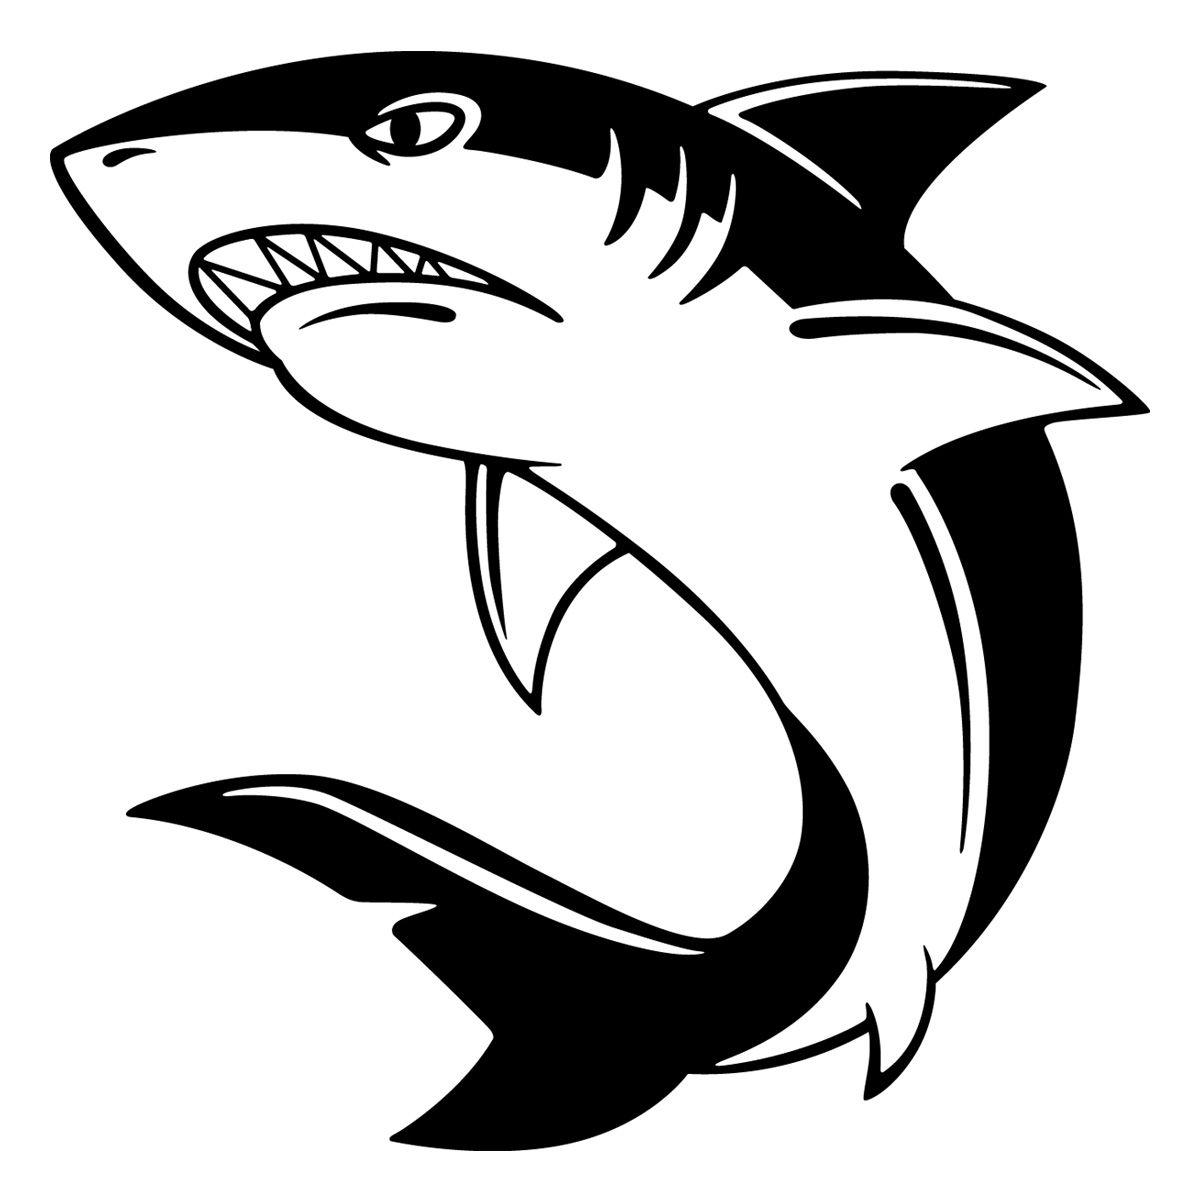 Shark Black And White Drawing Ourimgs Com The Hippest Galleries Shark Drawing Shark Art Tribal Shark